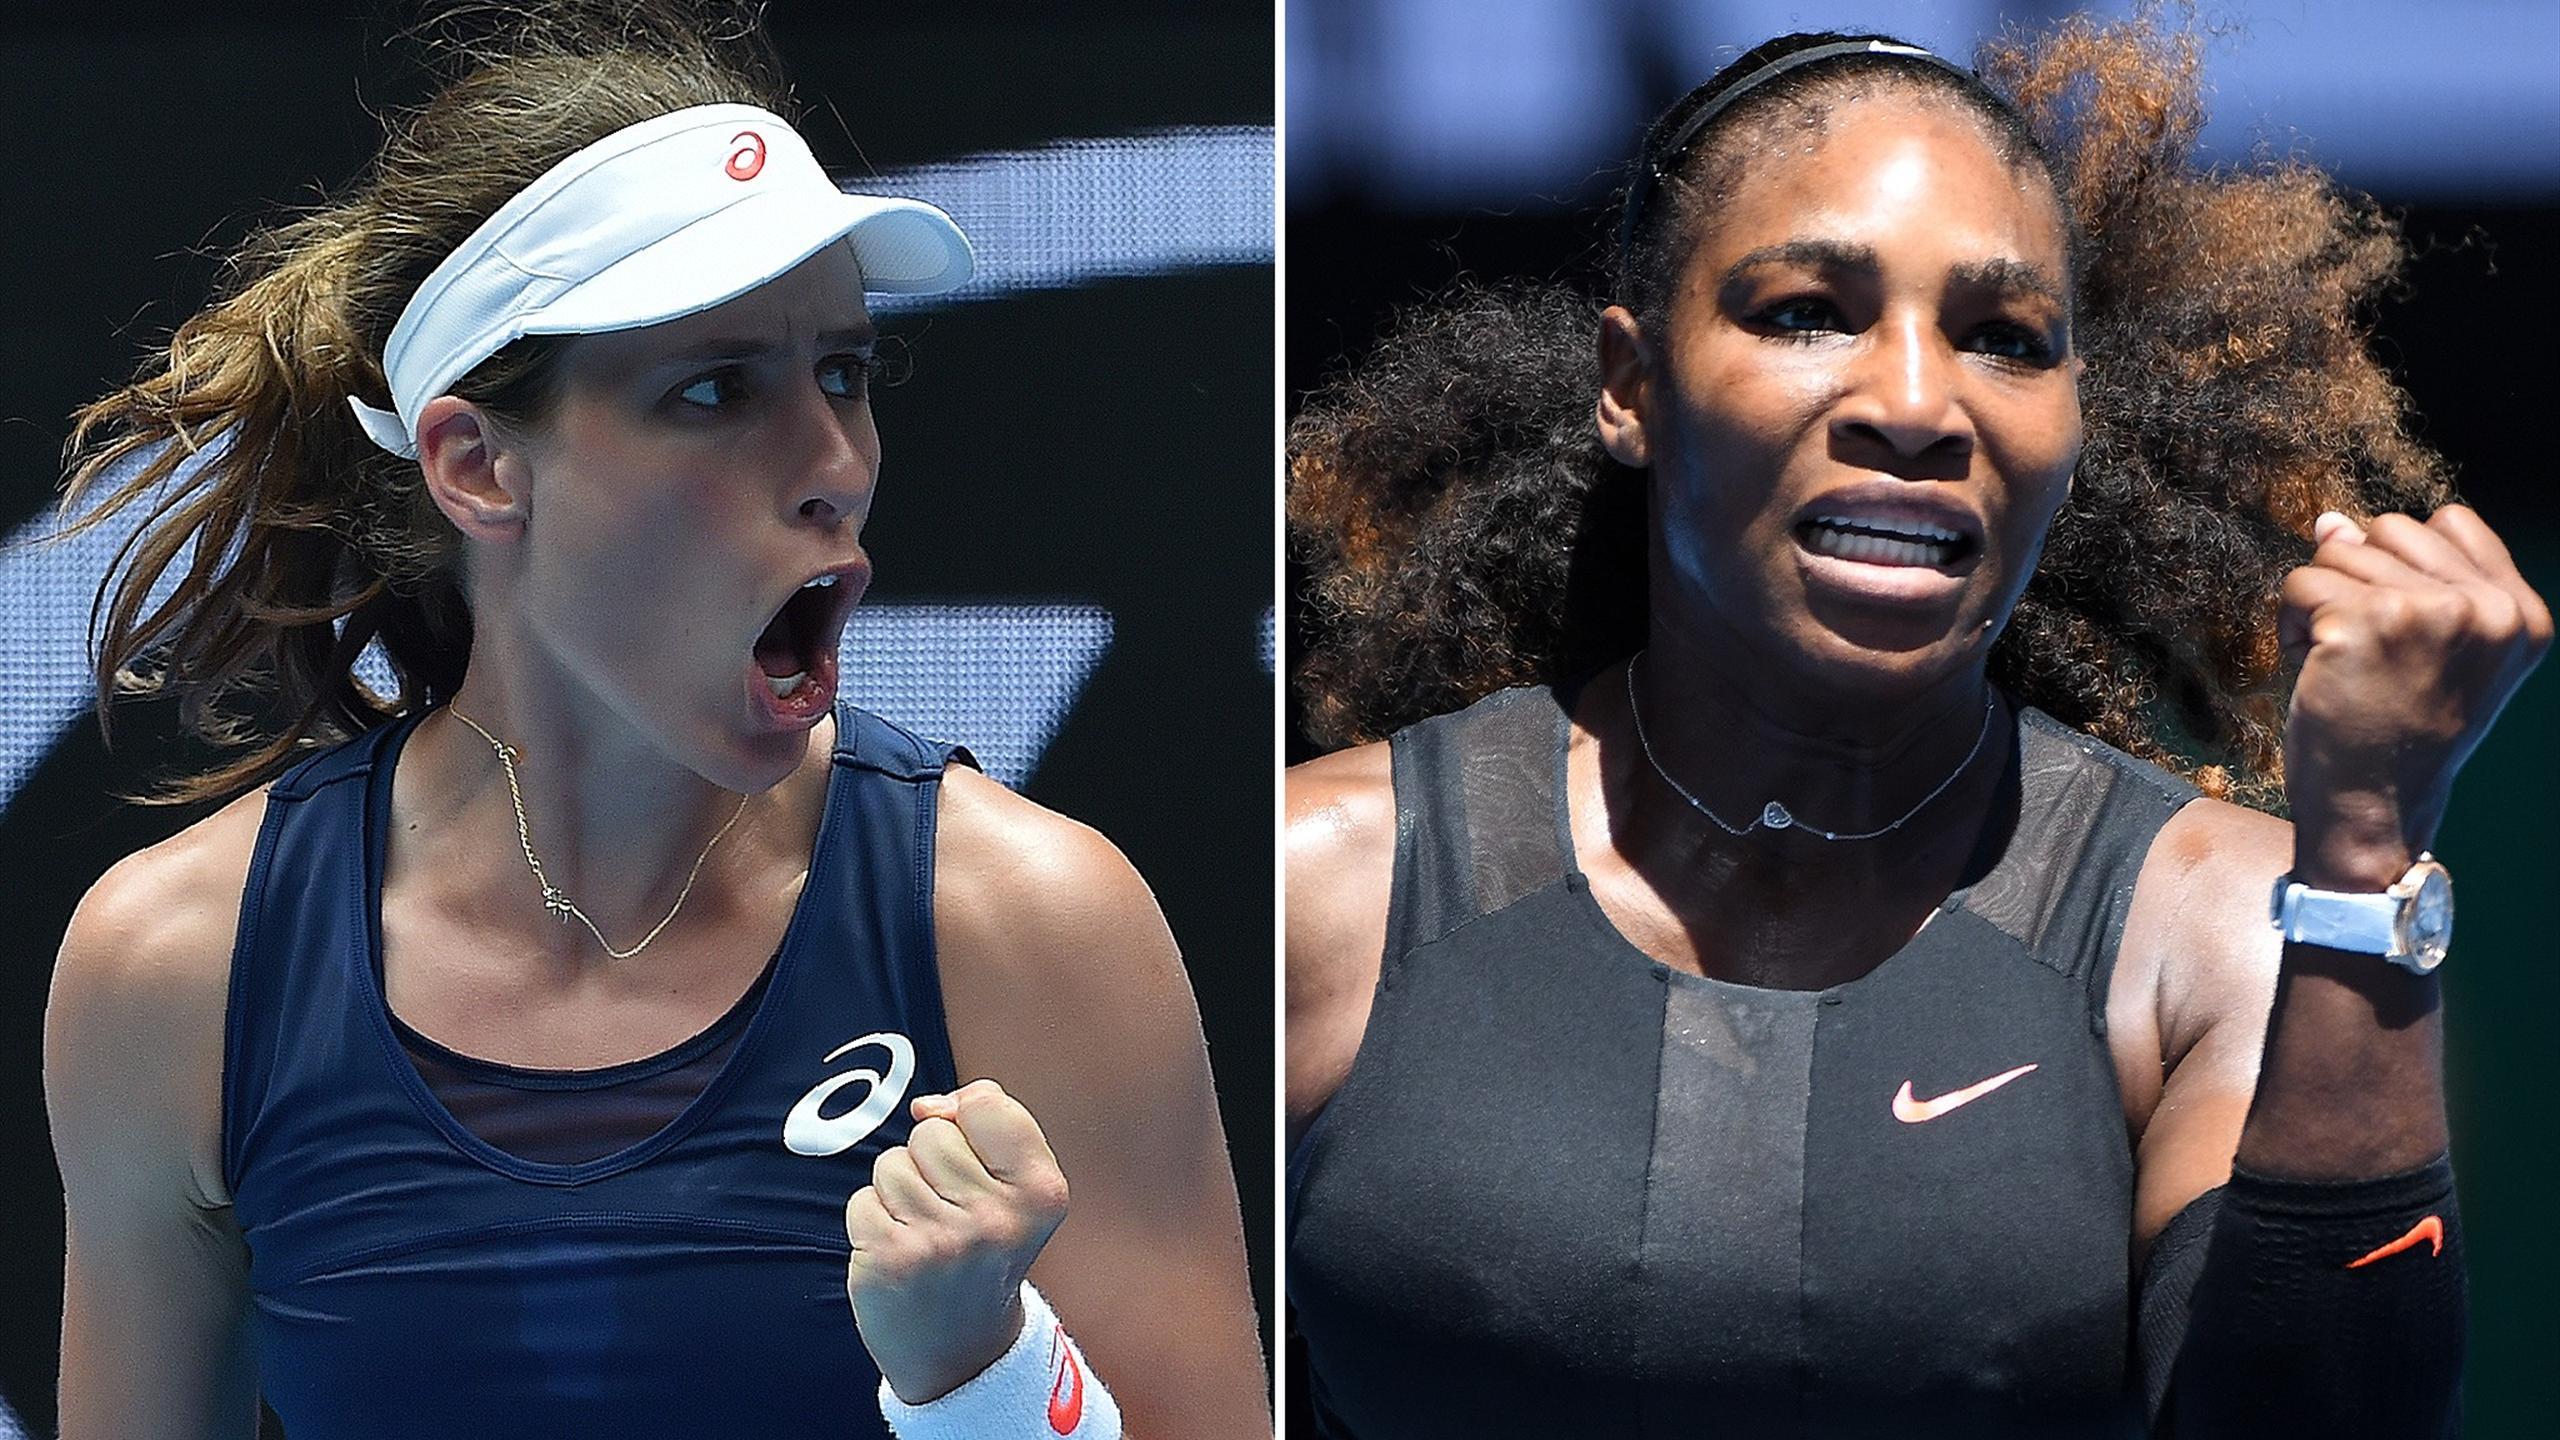 Jo Konta faces Serena Williams in the quarter-finals of the Australian Open